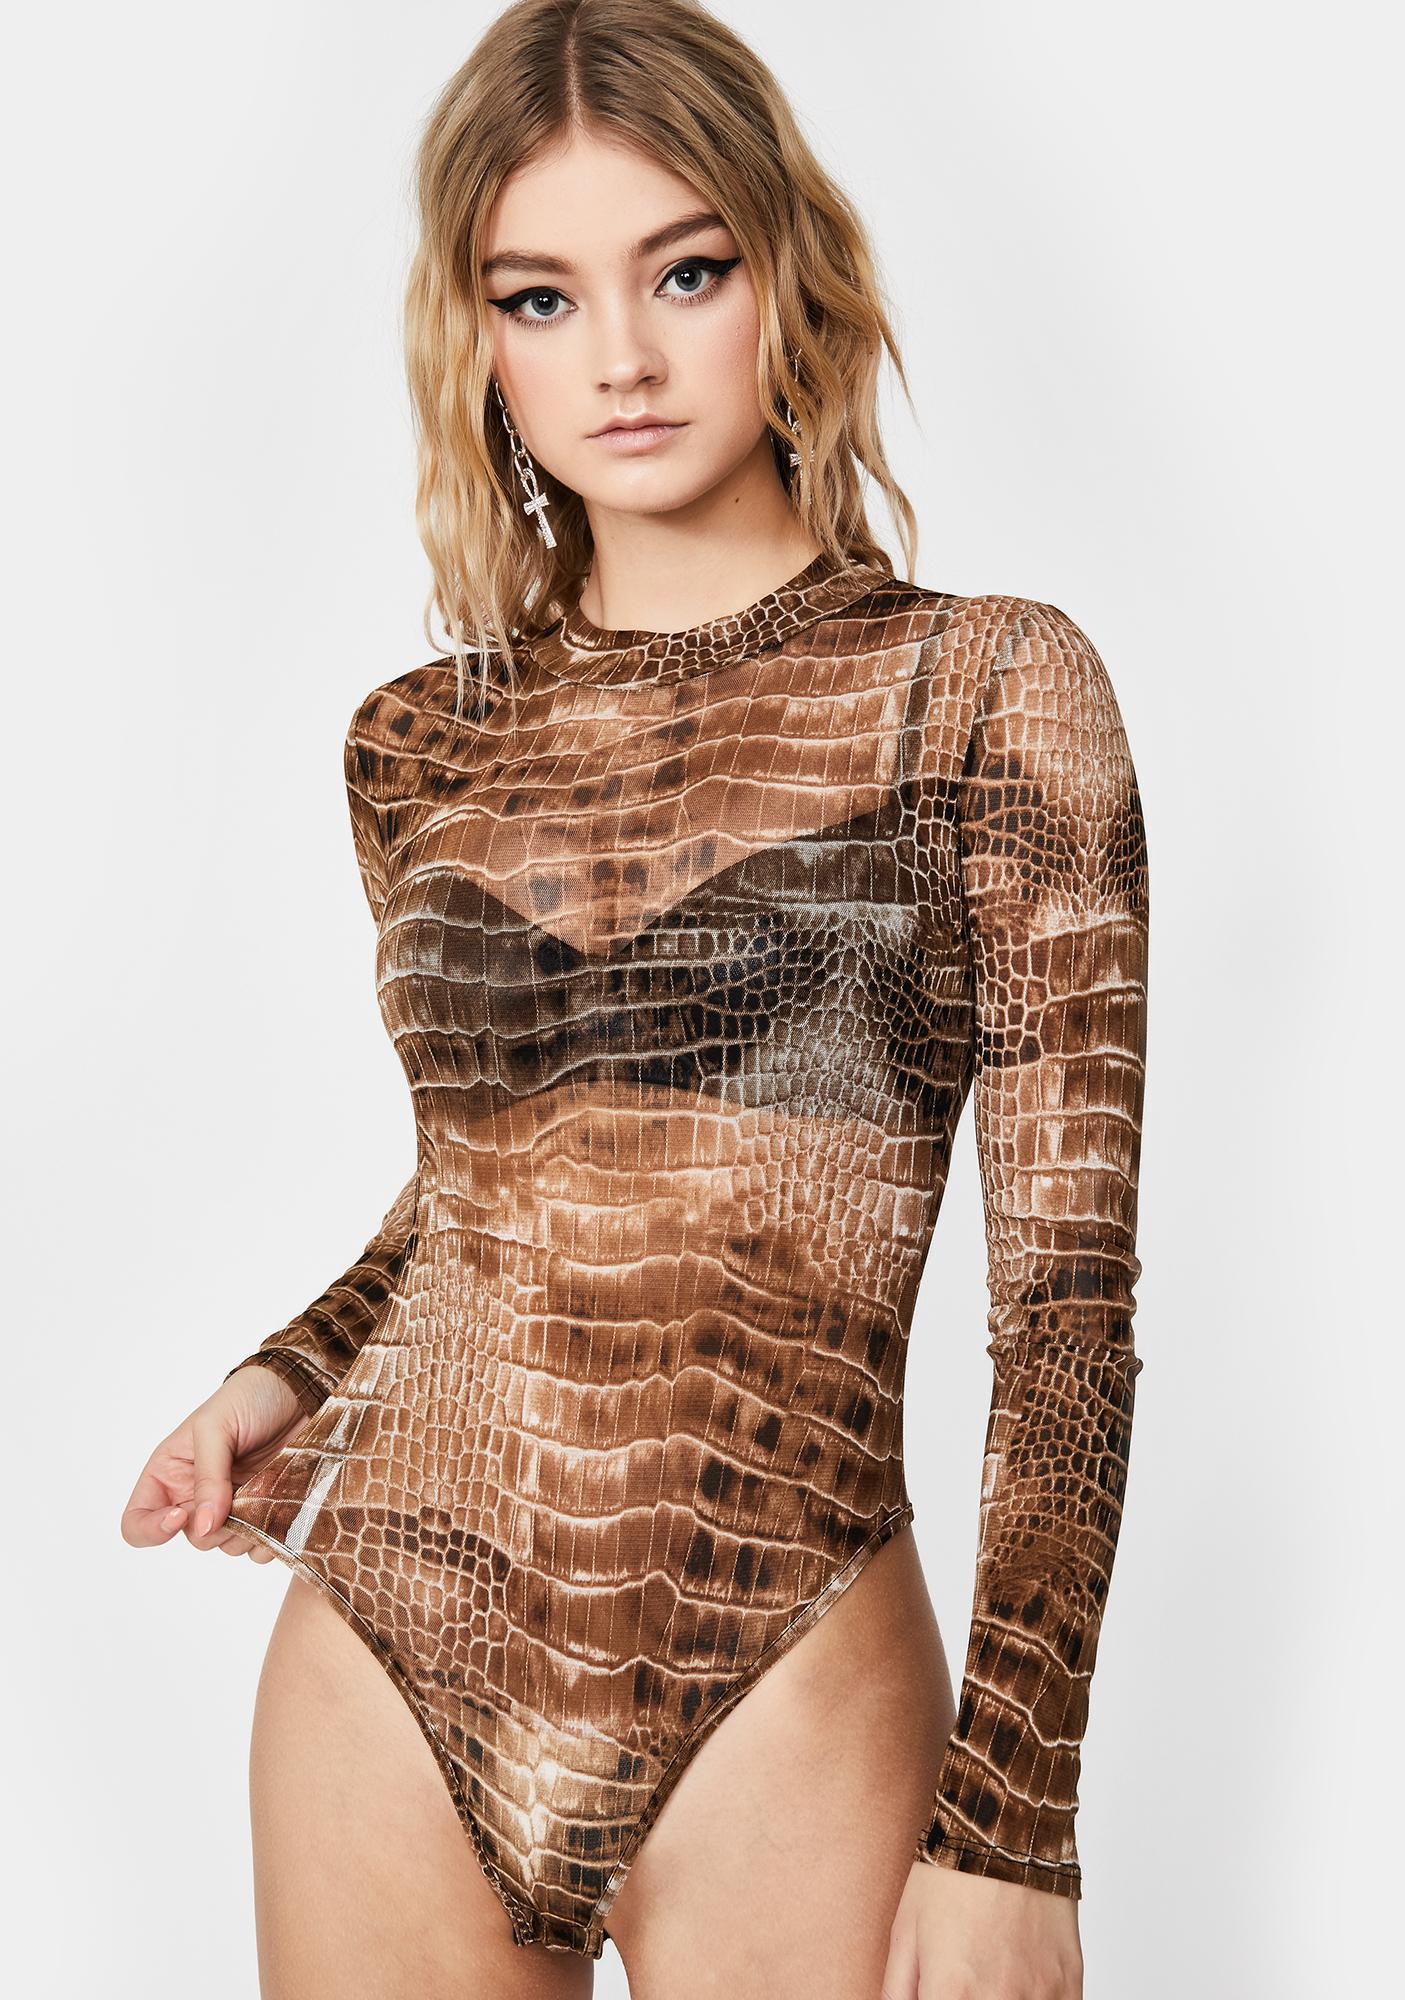 It's A Snap Crocodile Bodysuit